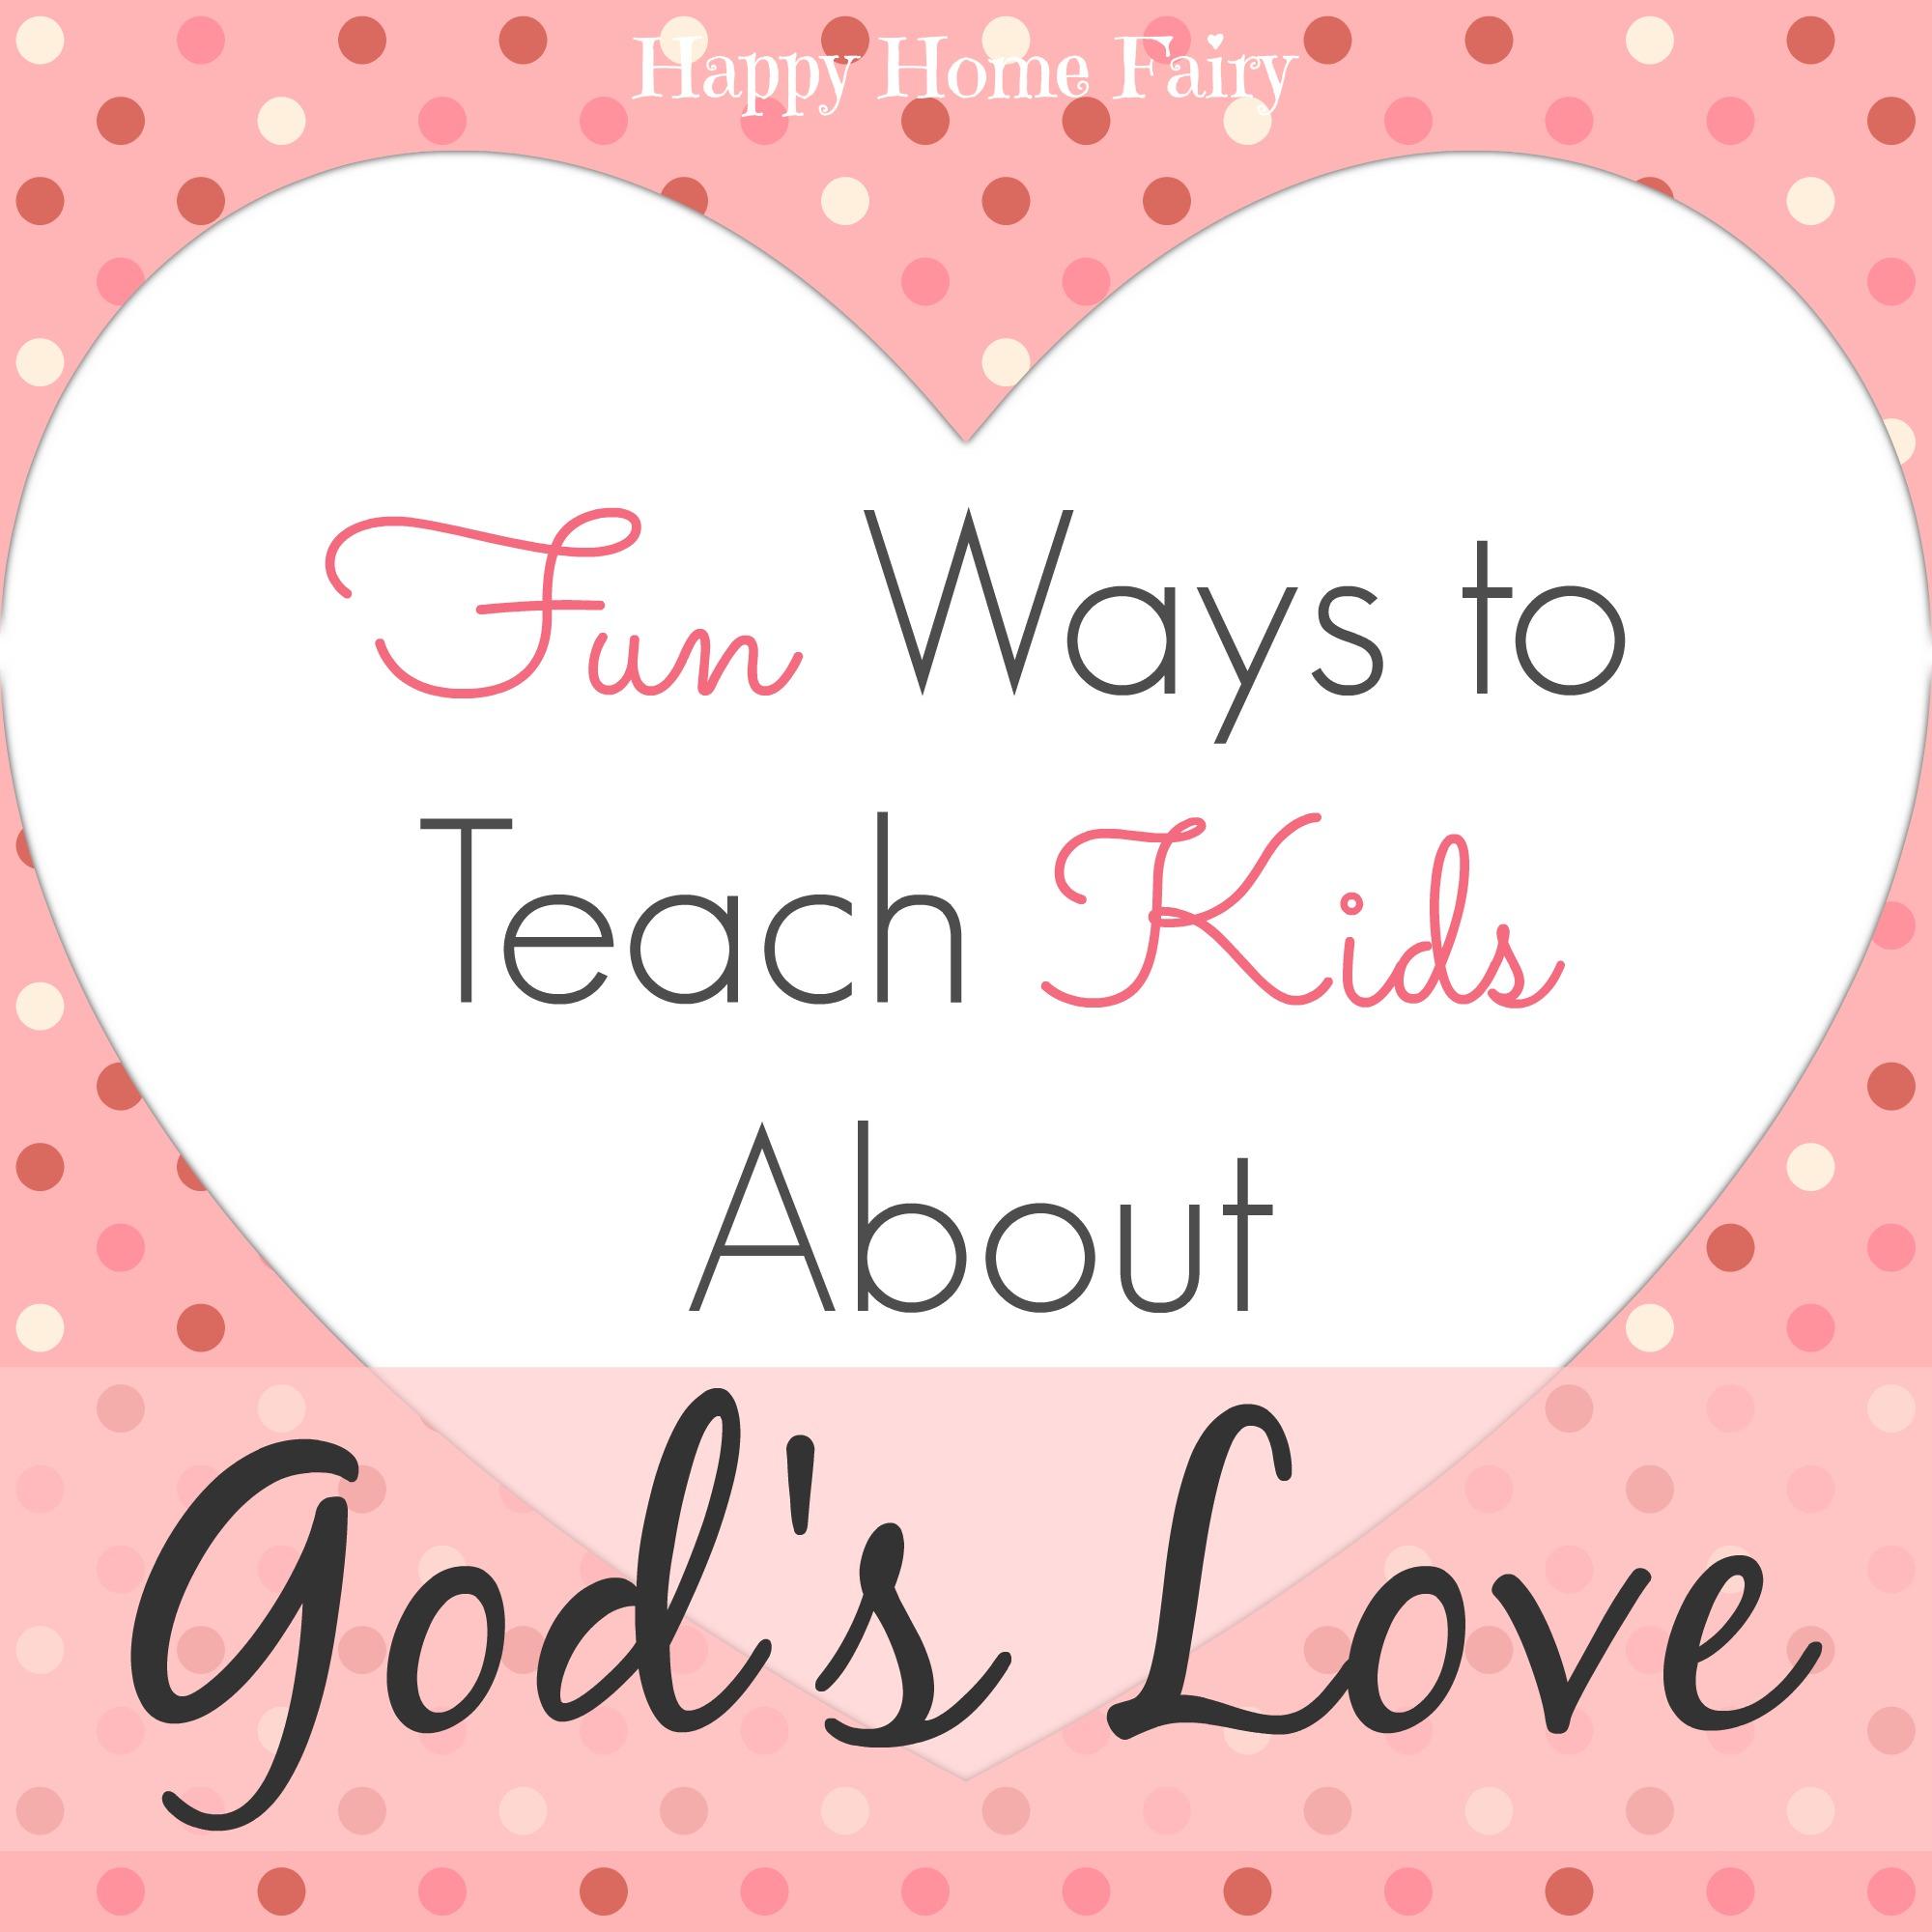 Fun Ways to Teach Kids About God's Love - Happy Home Fairy